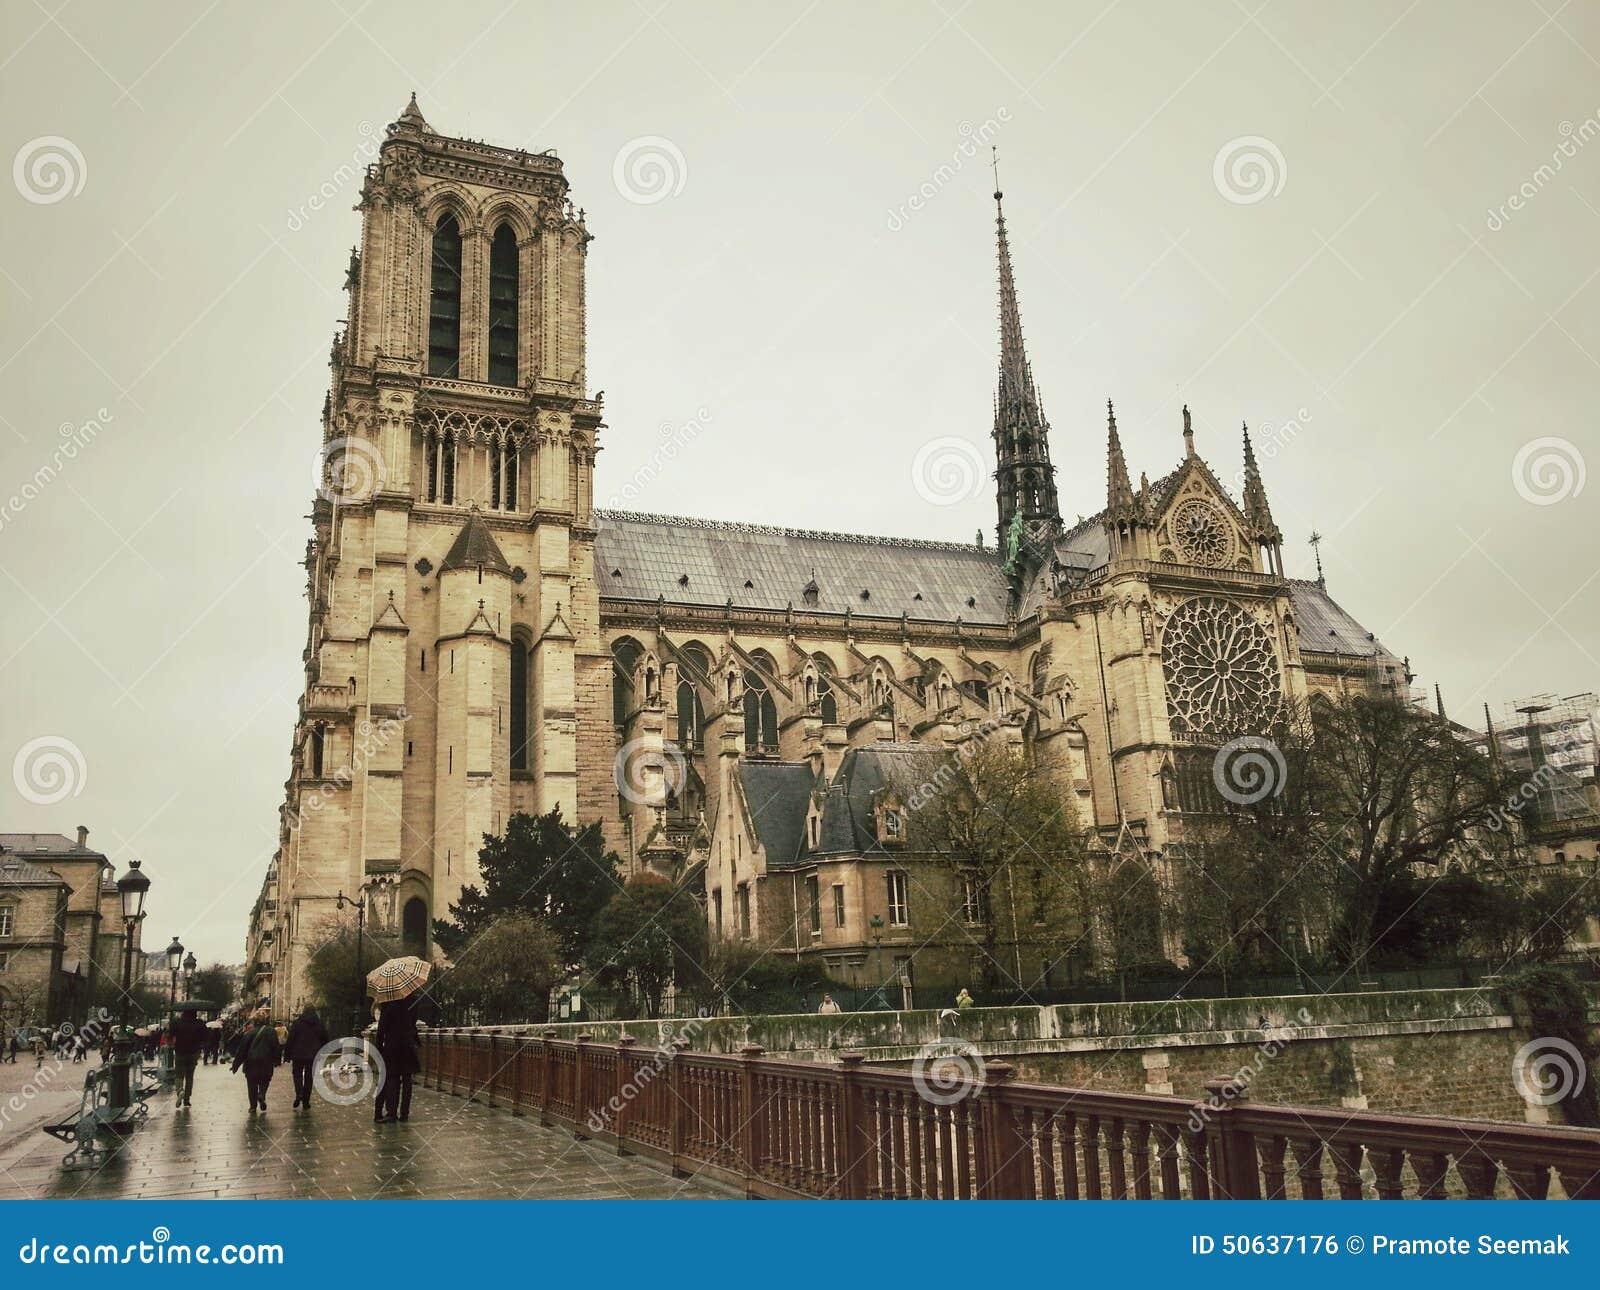 The significant theme of fate in notre dame de paris